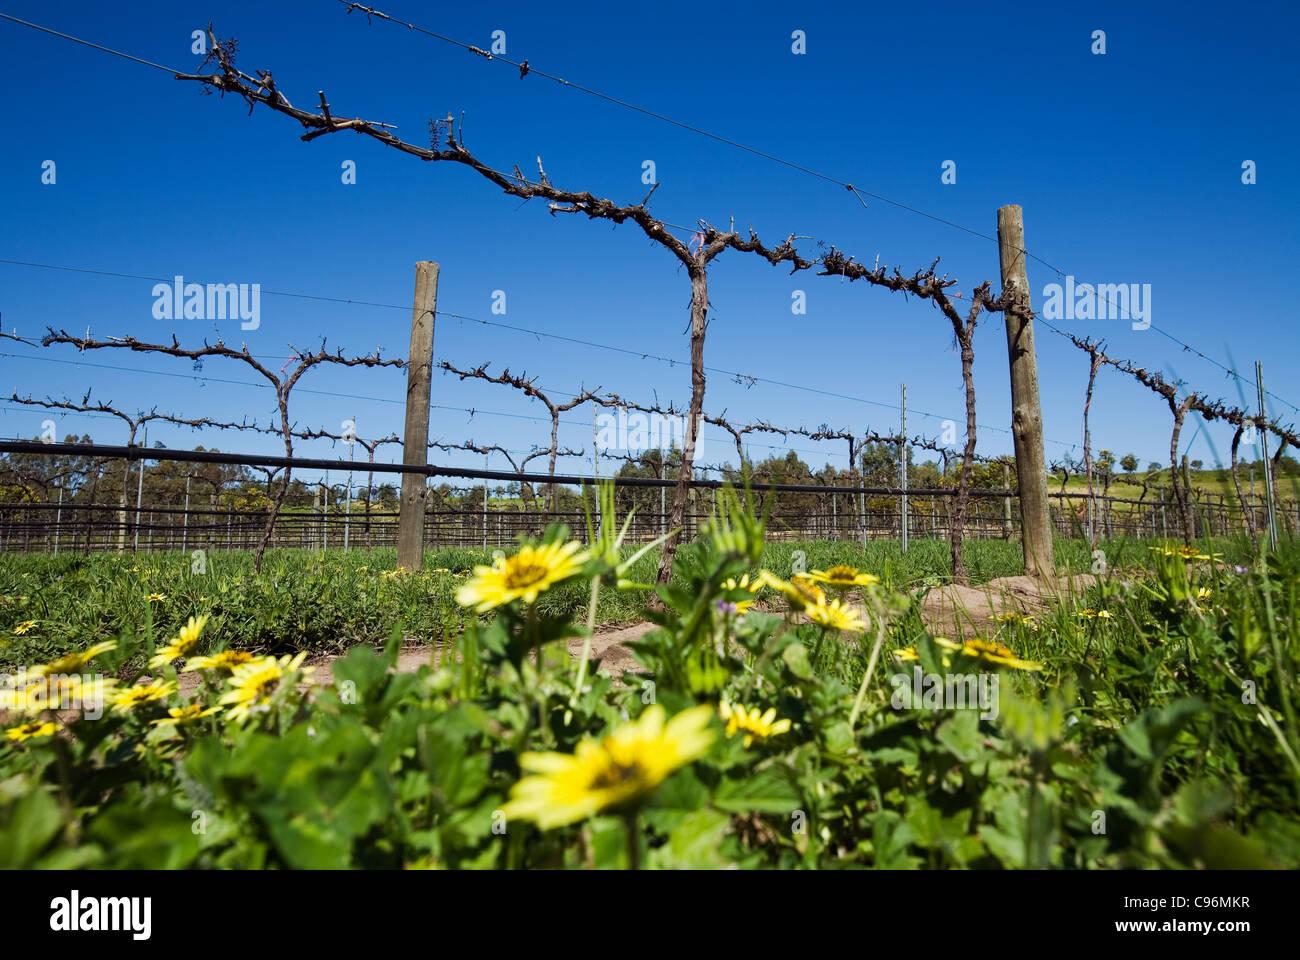 Vineyard in the renowned Barossa Valley wine region, close to Adelaide. Barossa Valley, South Australia, Australia Stock Photo